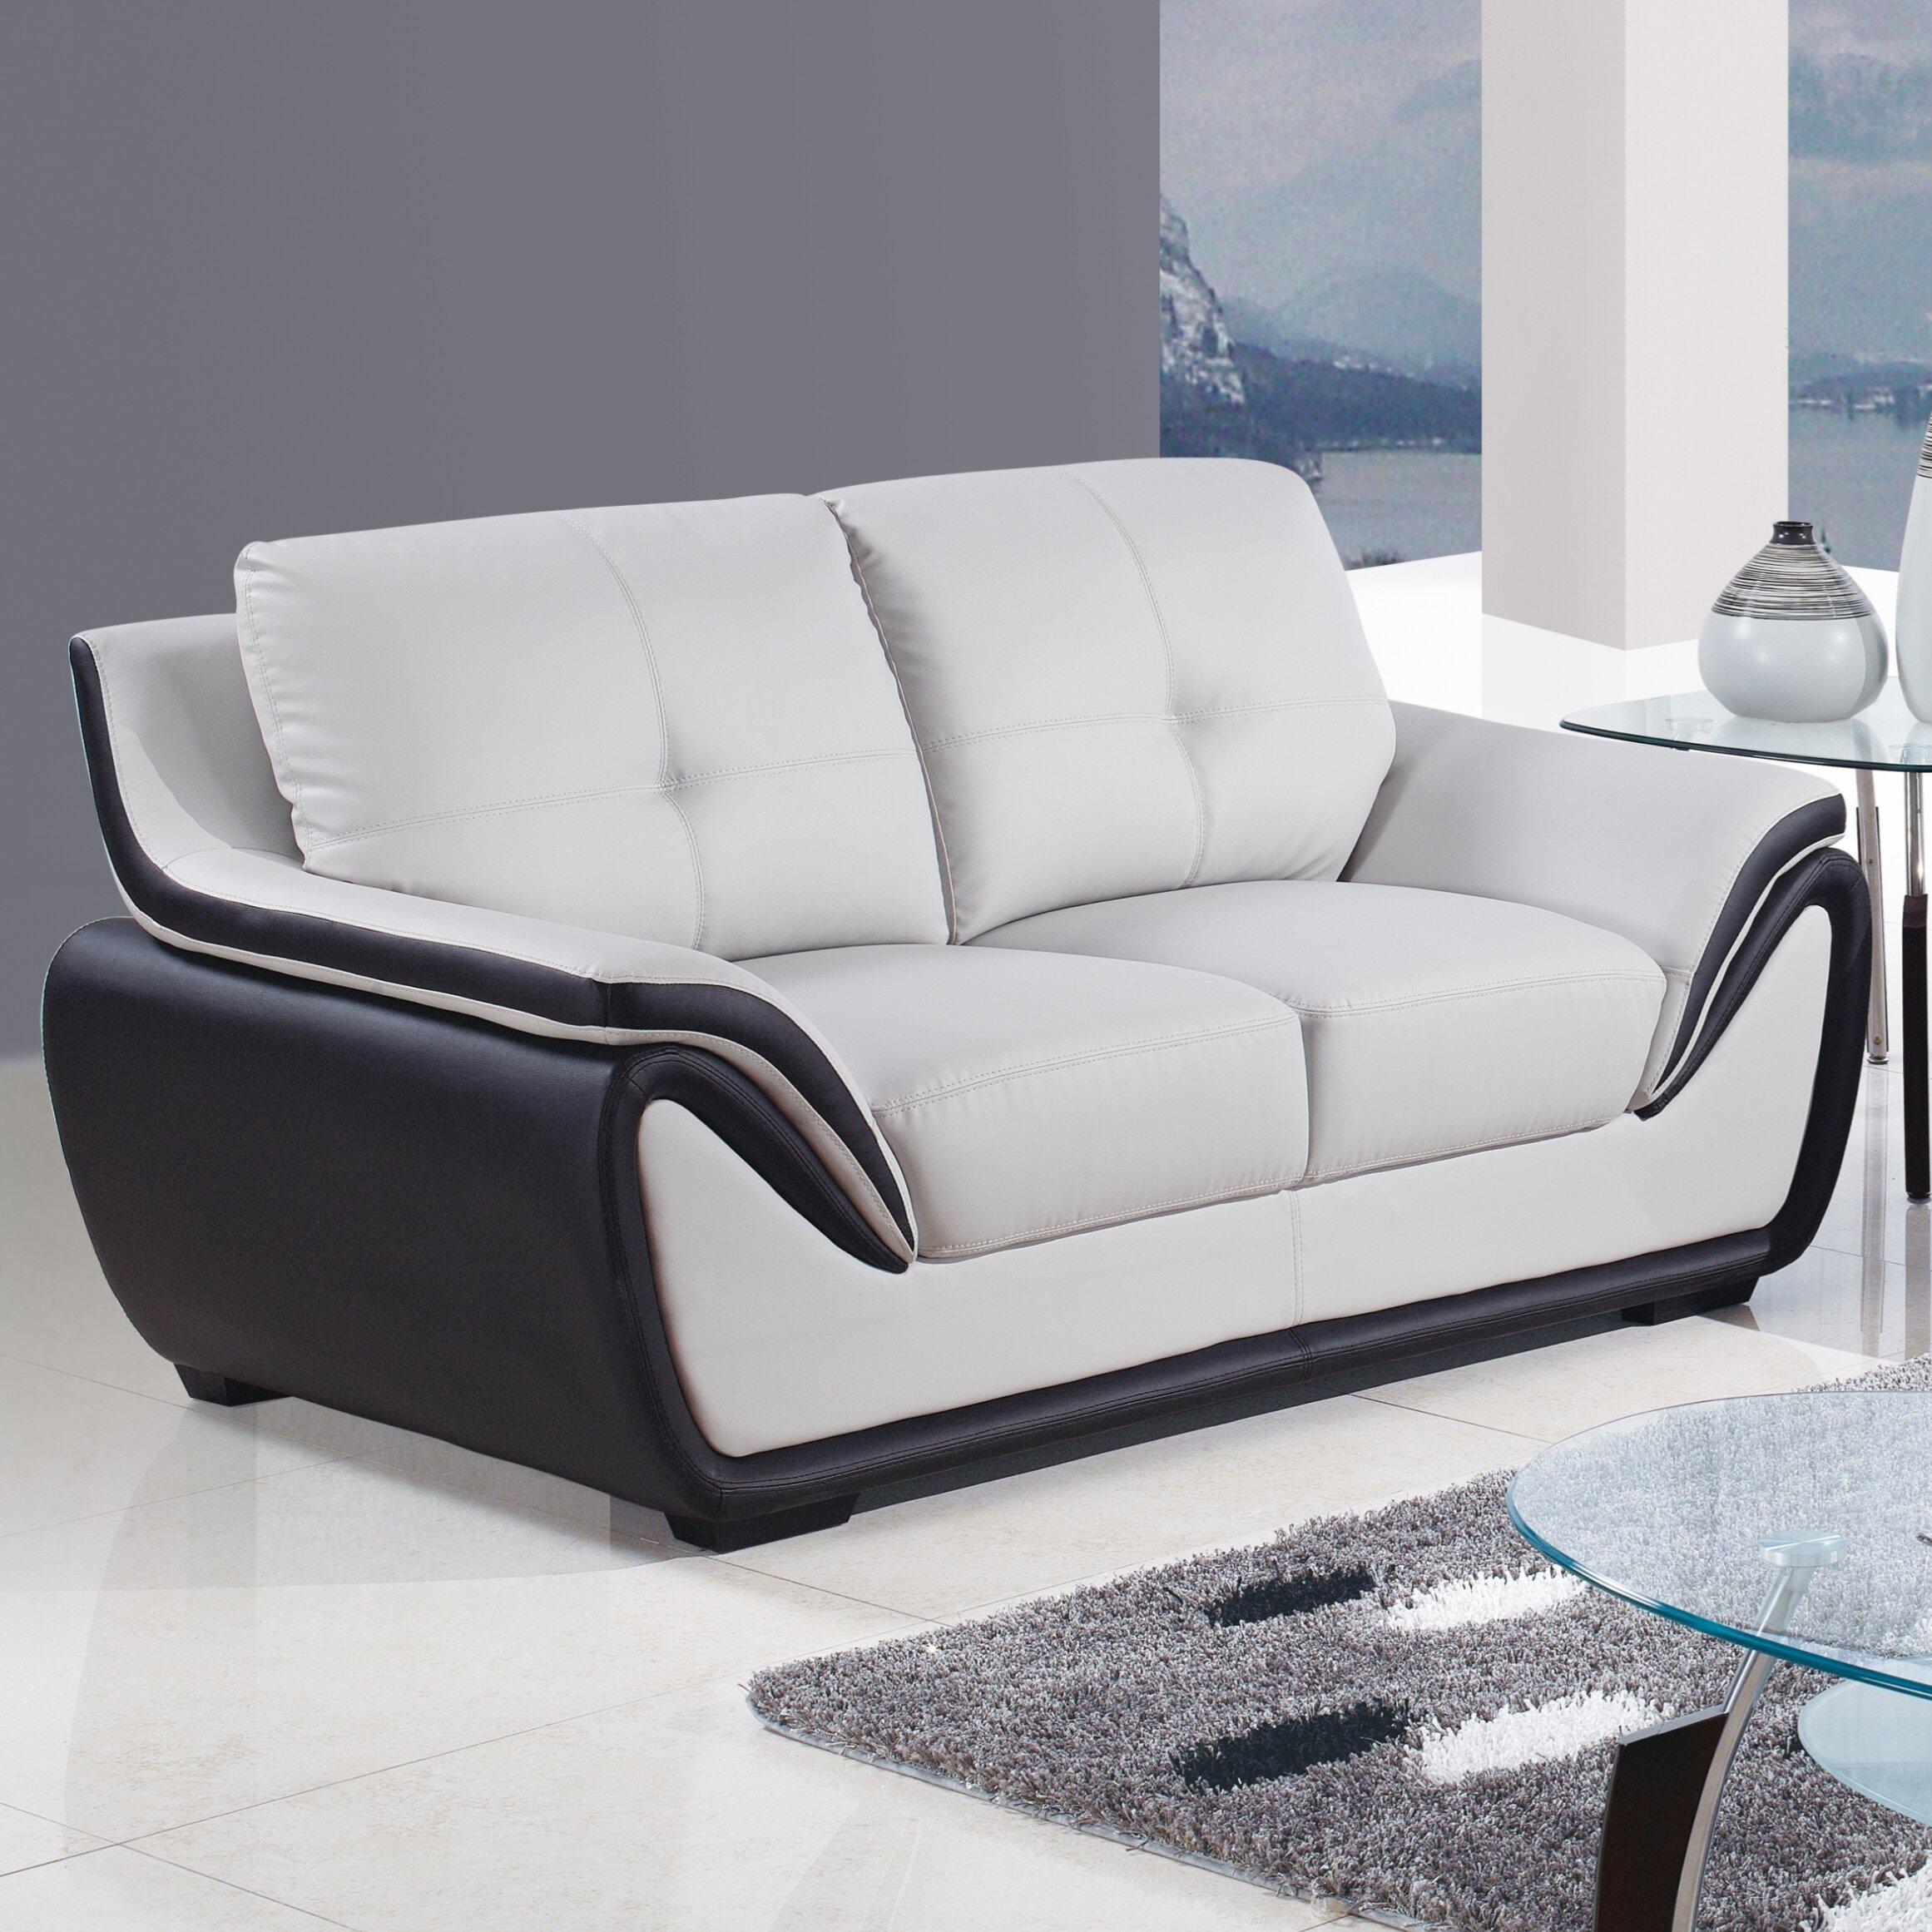 Global furniture usa loveseat wayfair for Buy sofa online usa